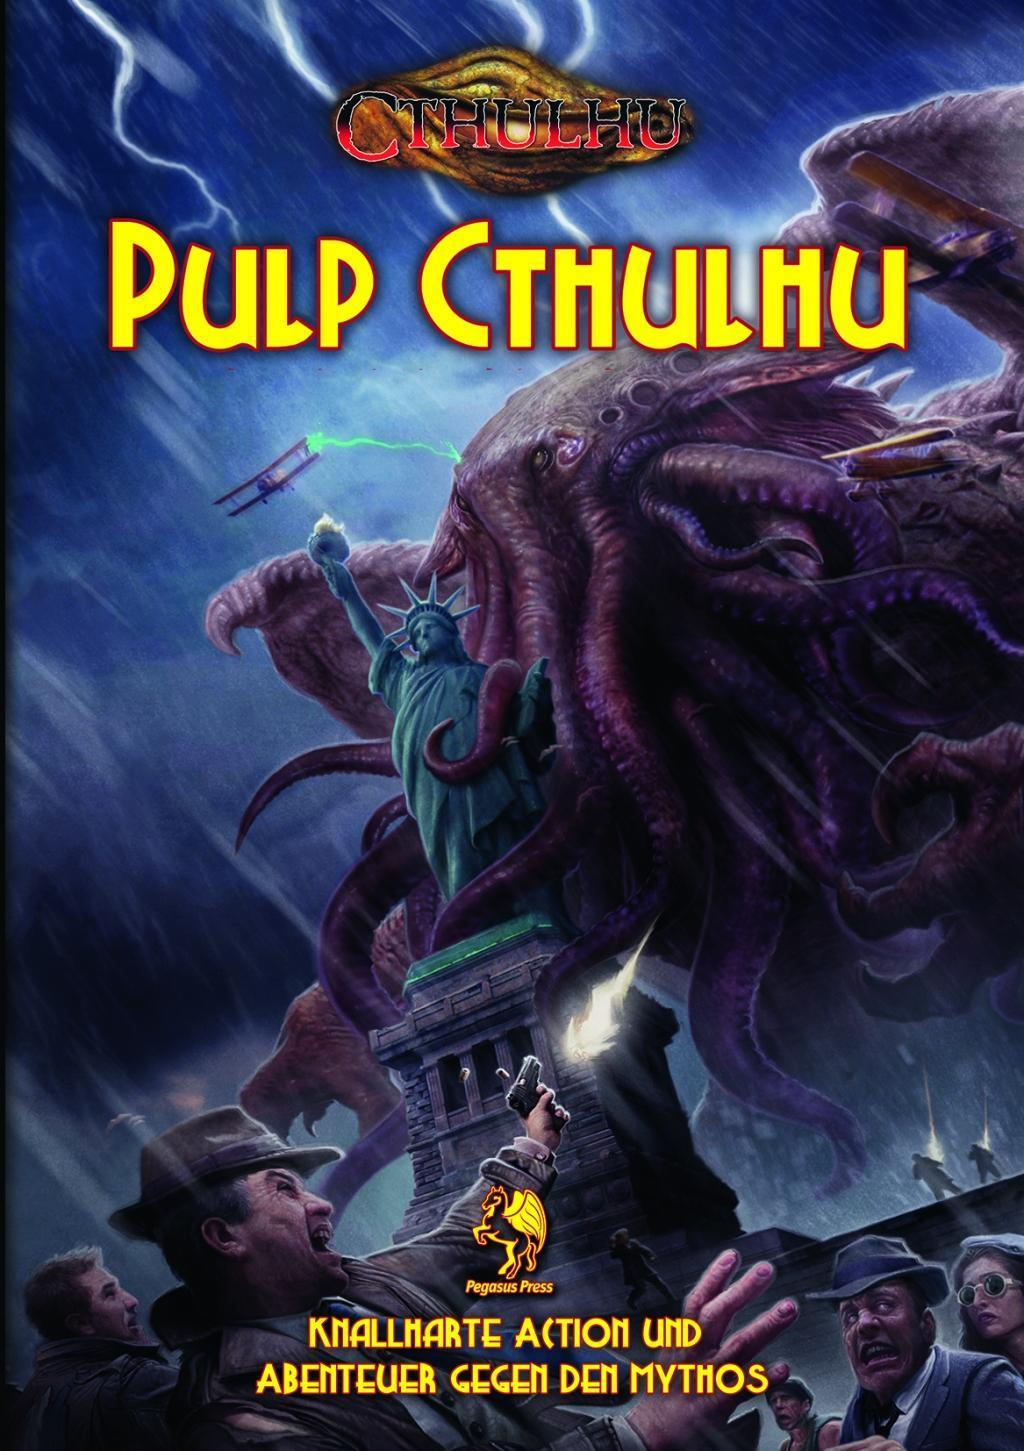 Cthulhu: Pulp Cthulhu (Hardcover) \*limitierte Ausgabe\*